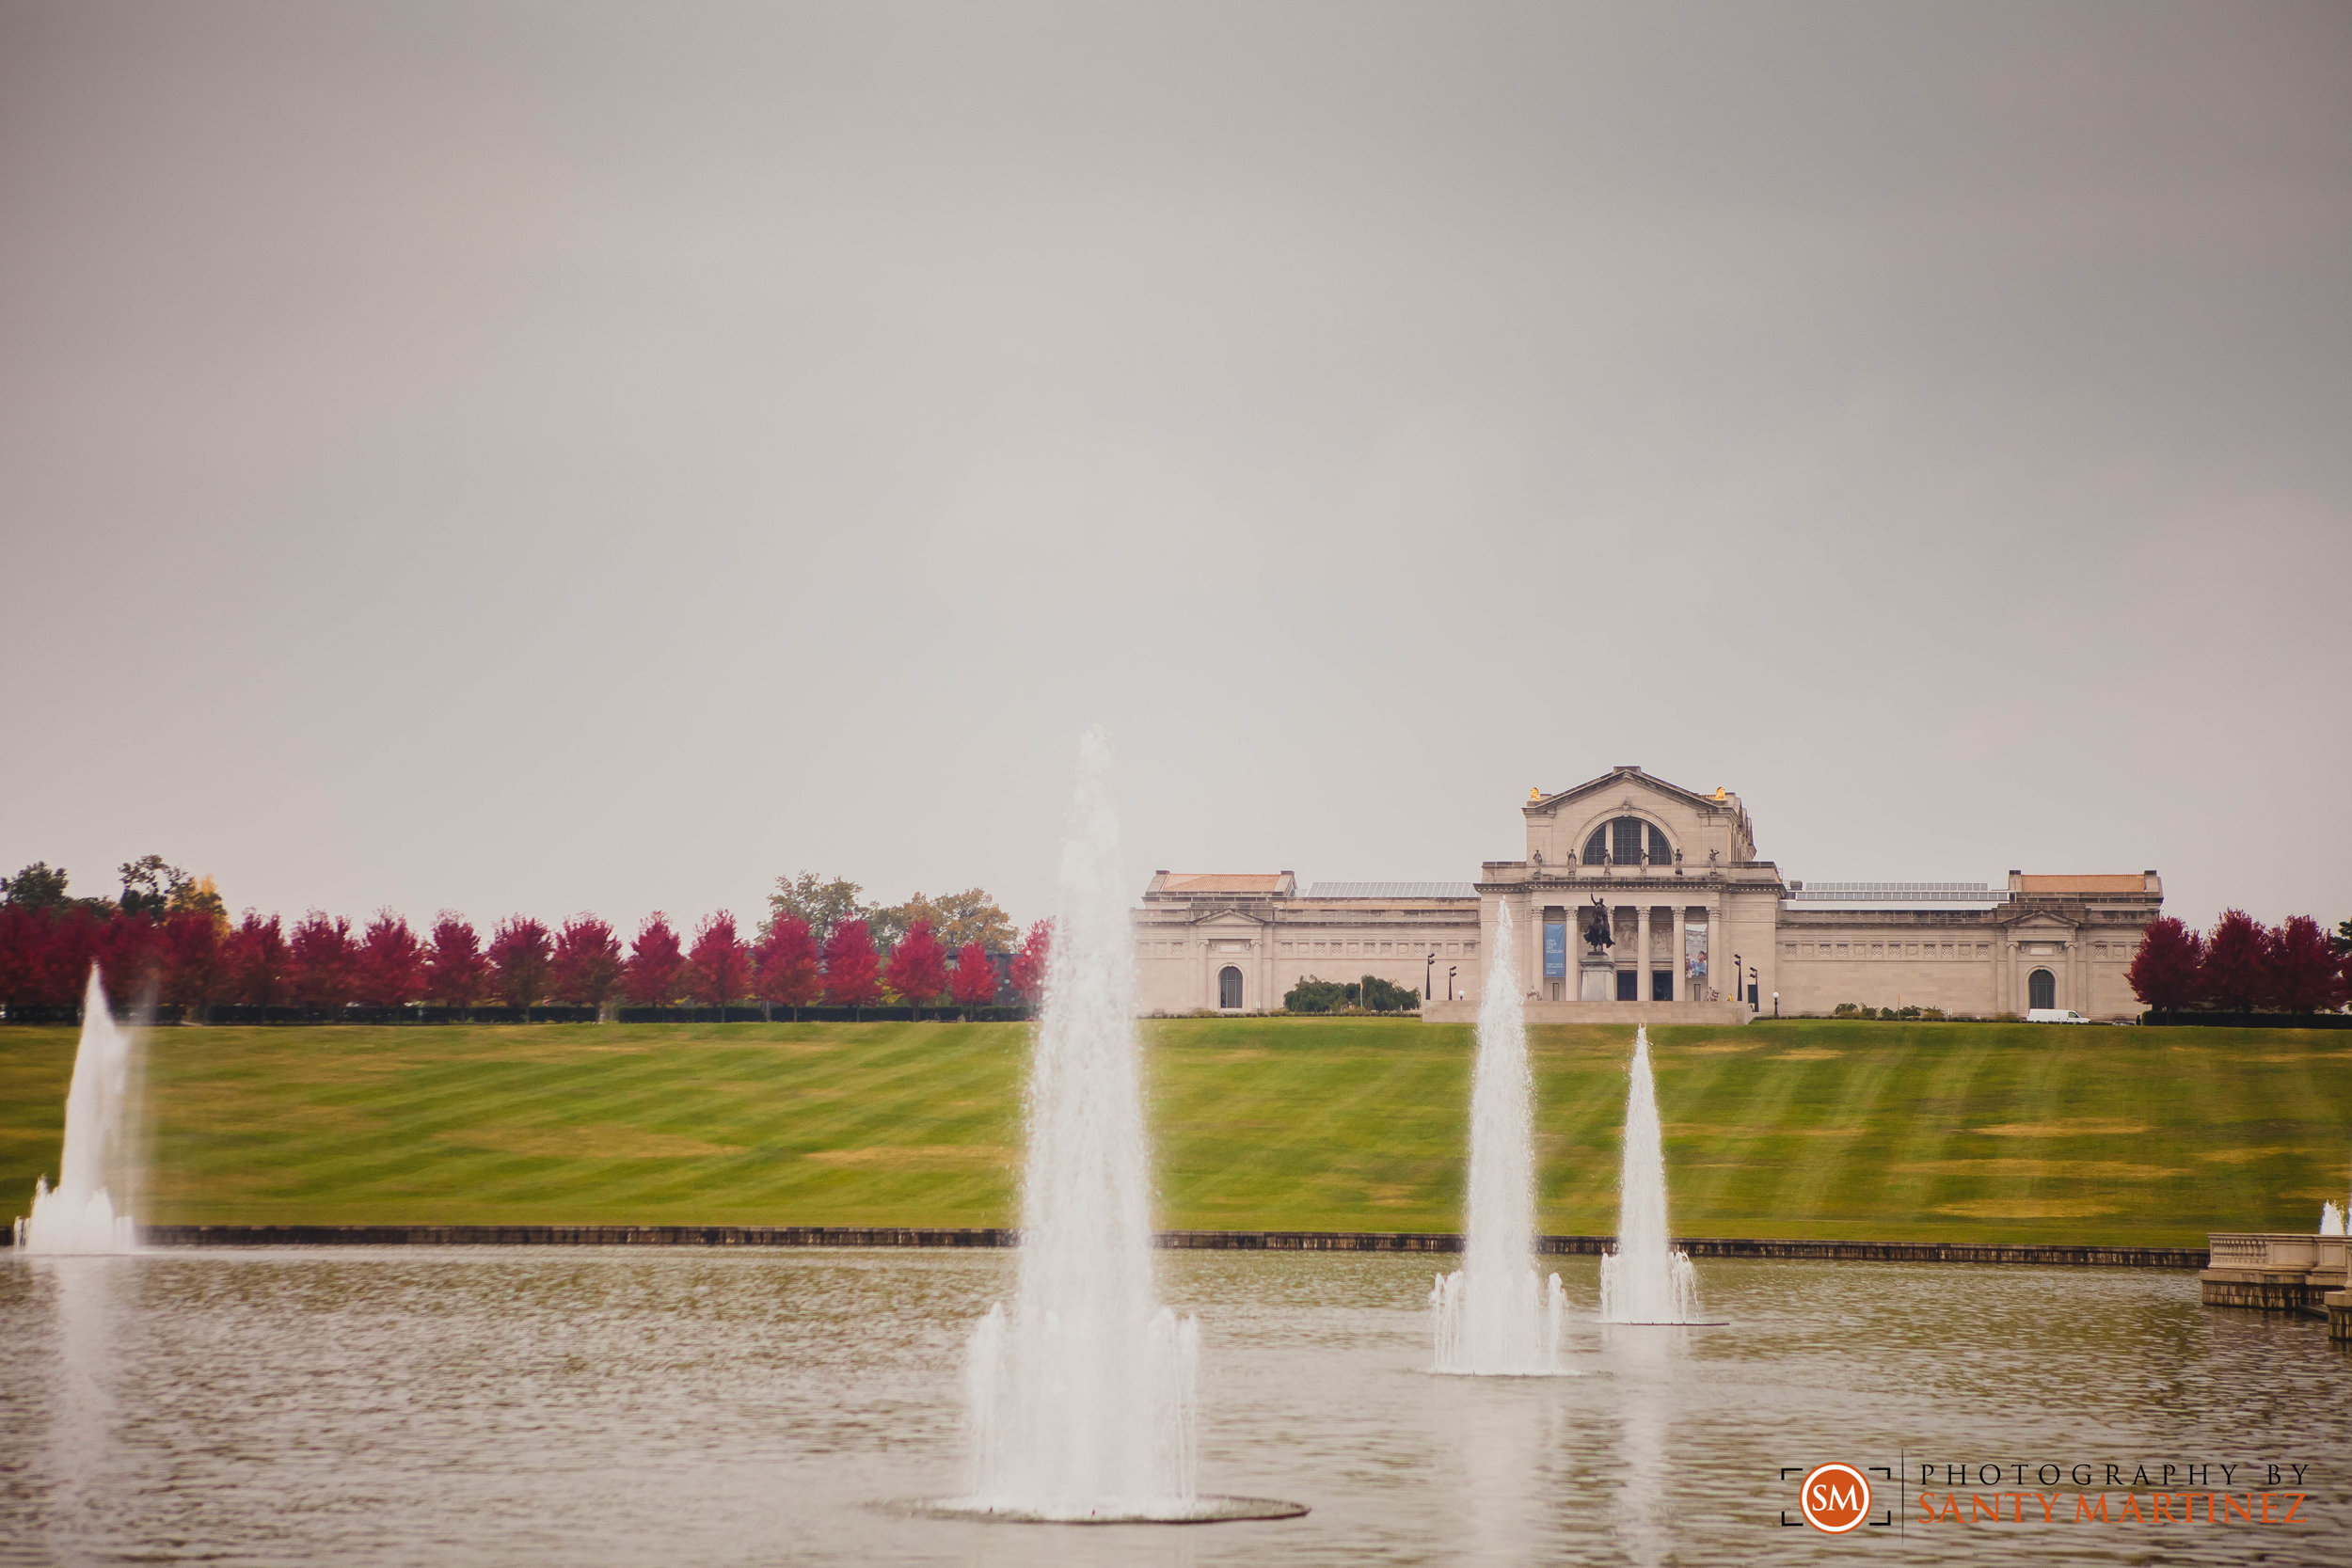 Travel St Louis Missouri - Photography Santy Martinez-5.jpg